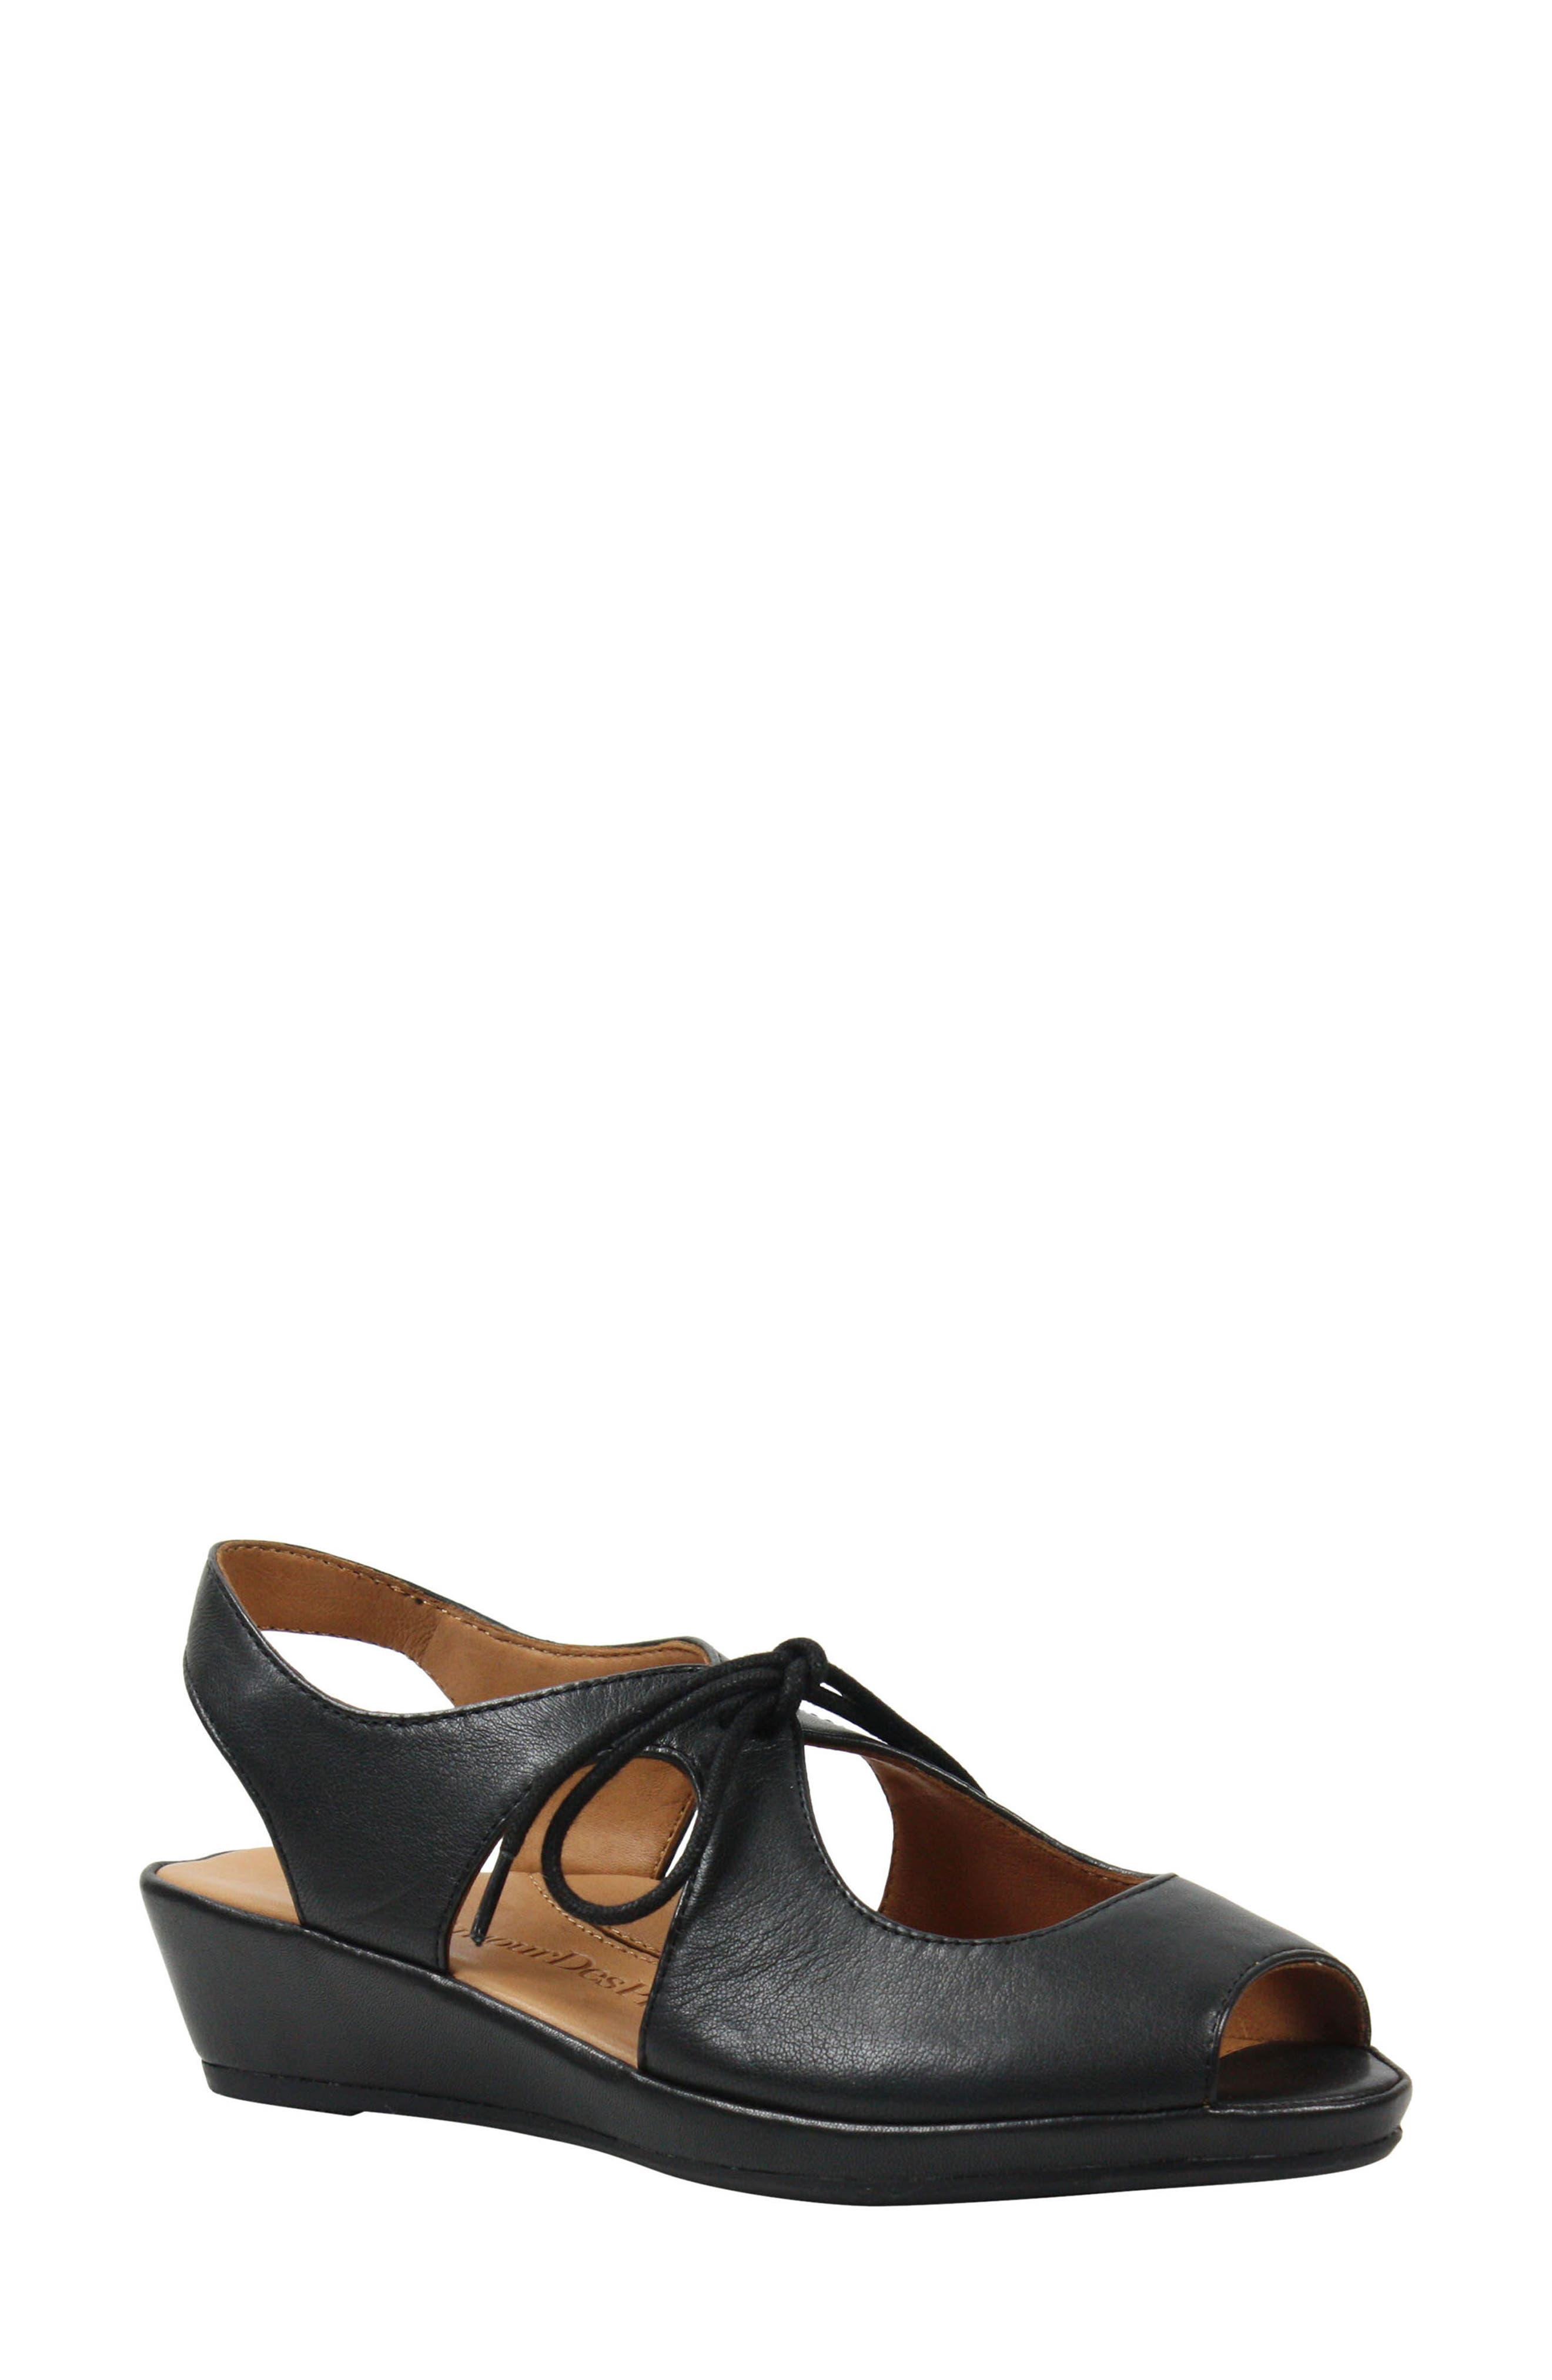 Vintage Sandal History: Retro 1920s to 1970s Sandals Womens LAmour Des Pieds Brettany Sandal $119.90 AT vintagedancer.com